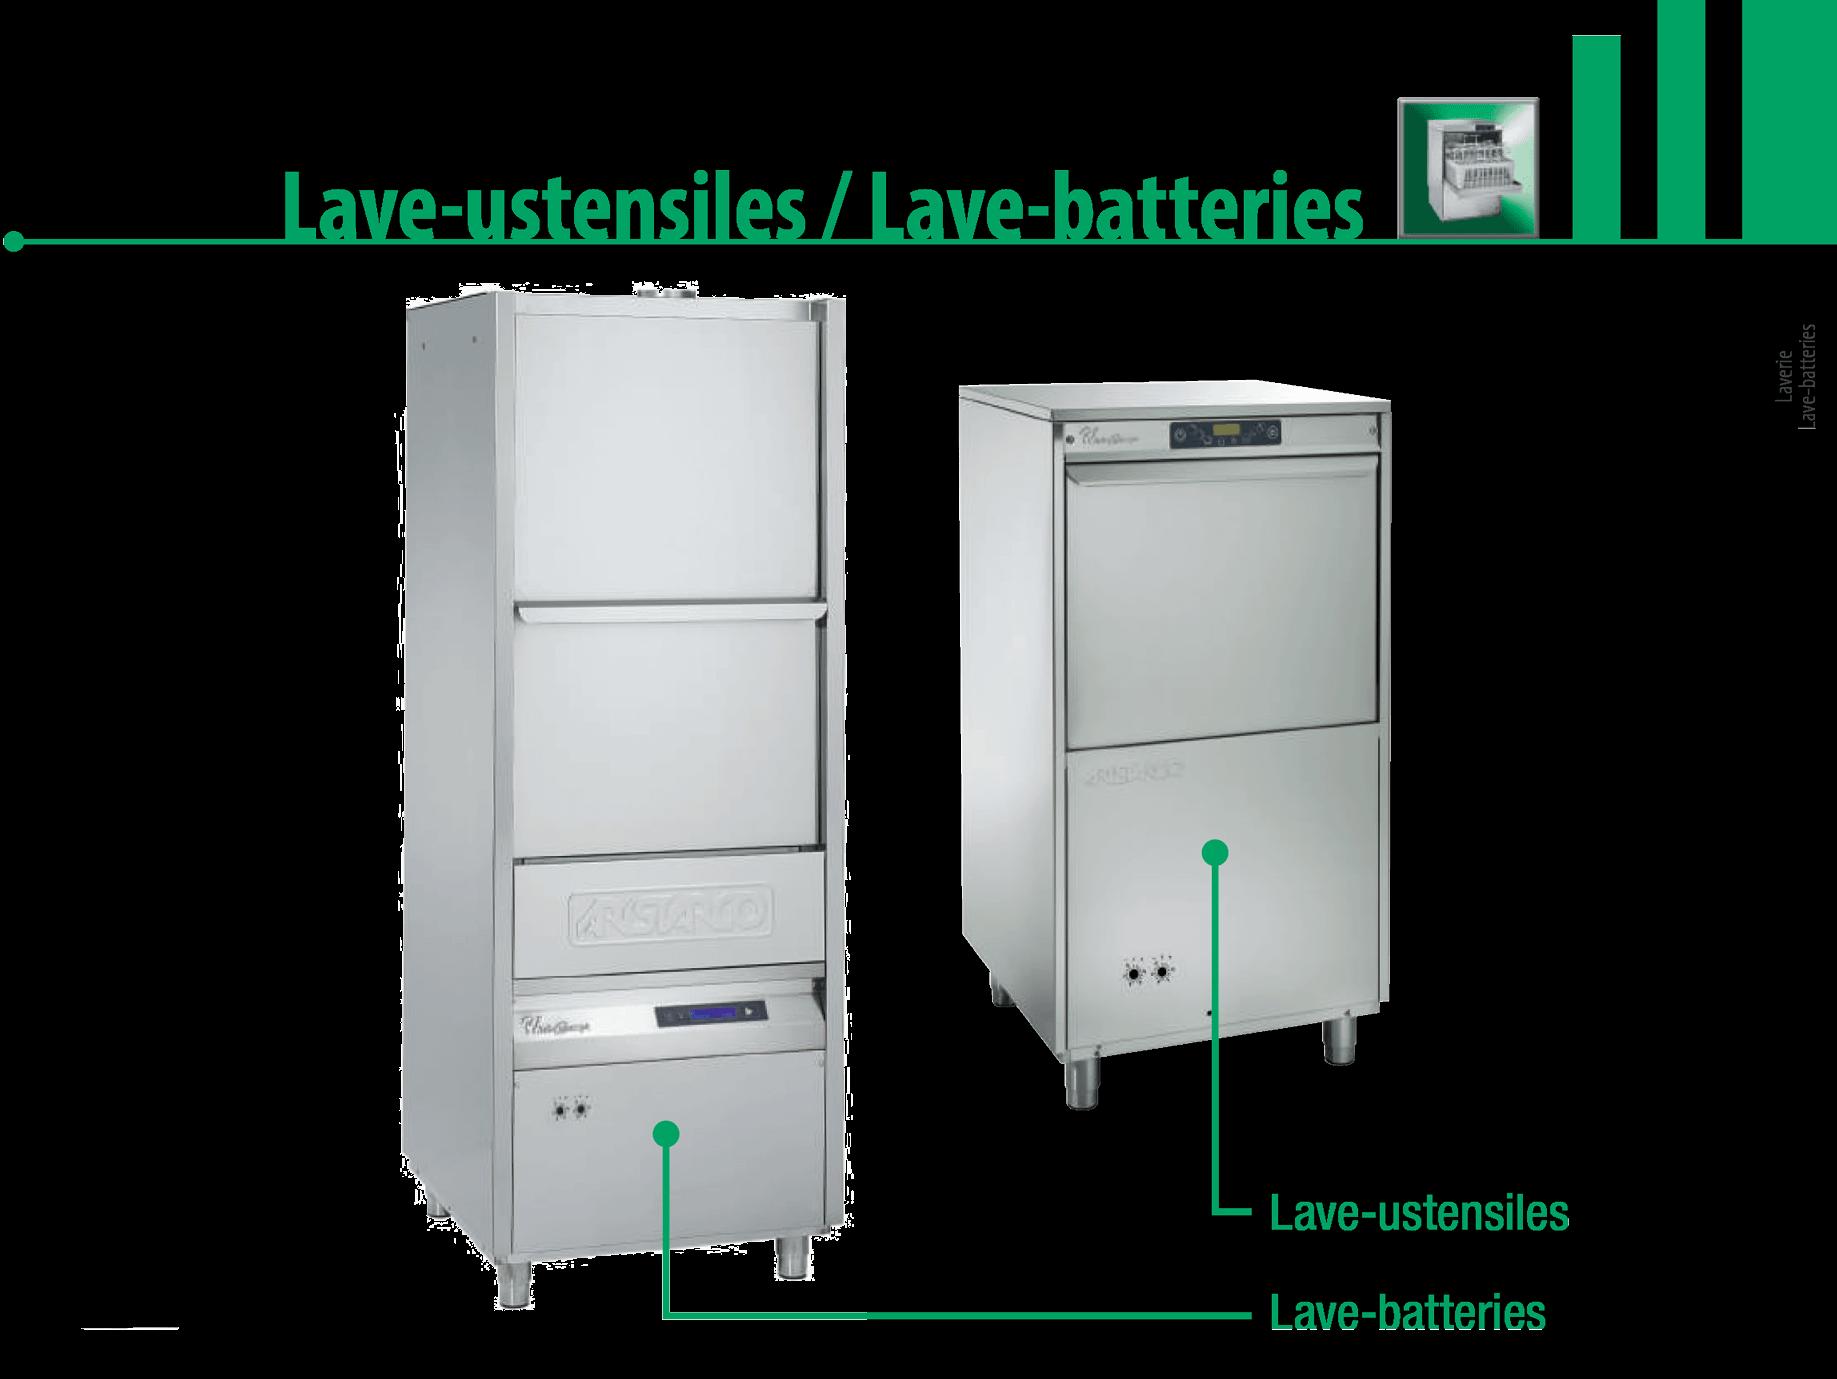 Lave-batteries/ustensiles